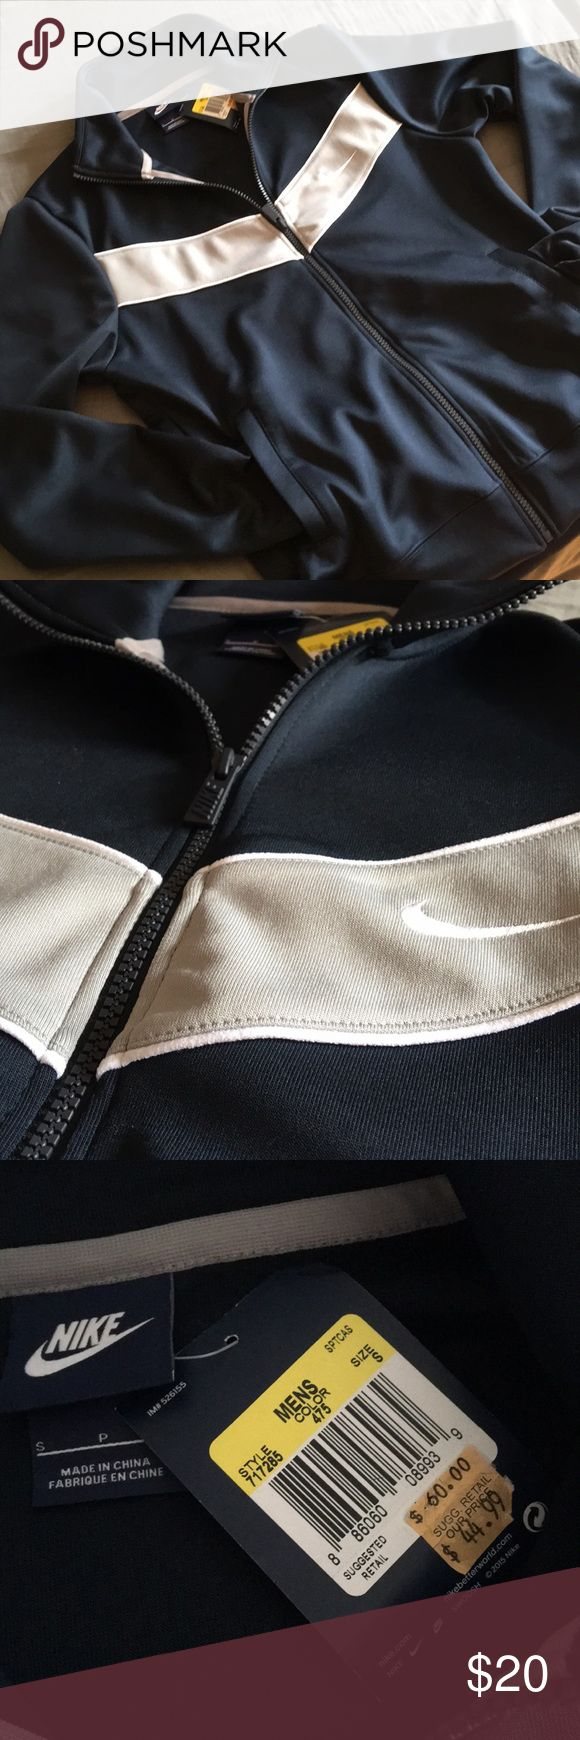 Nike men's sports jacket Men's Nike sports jacket, size S, new with tag Nike Jackets & Coats